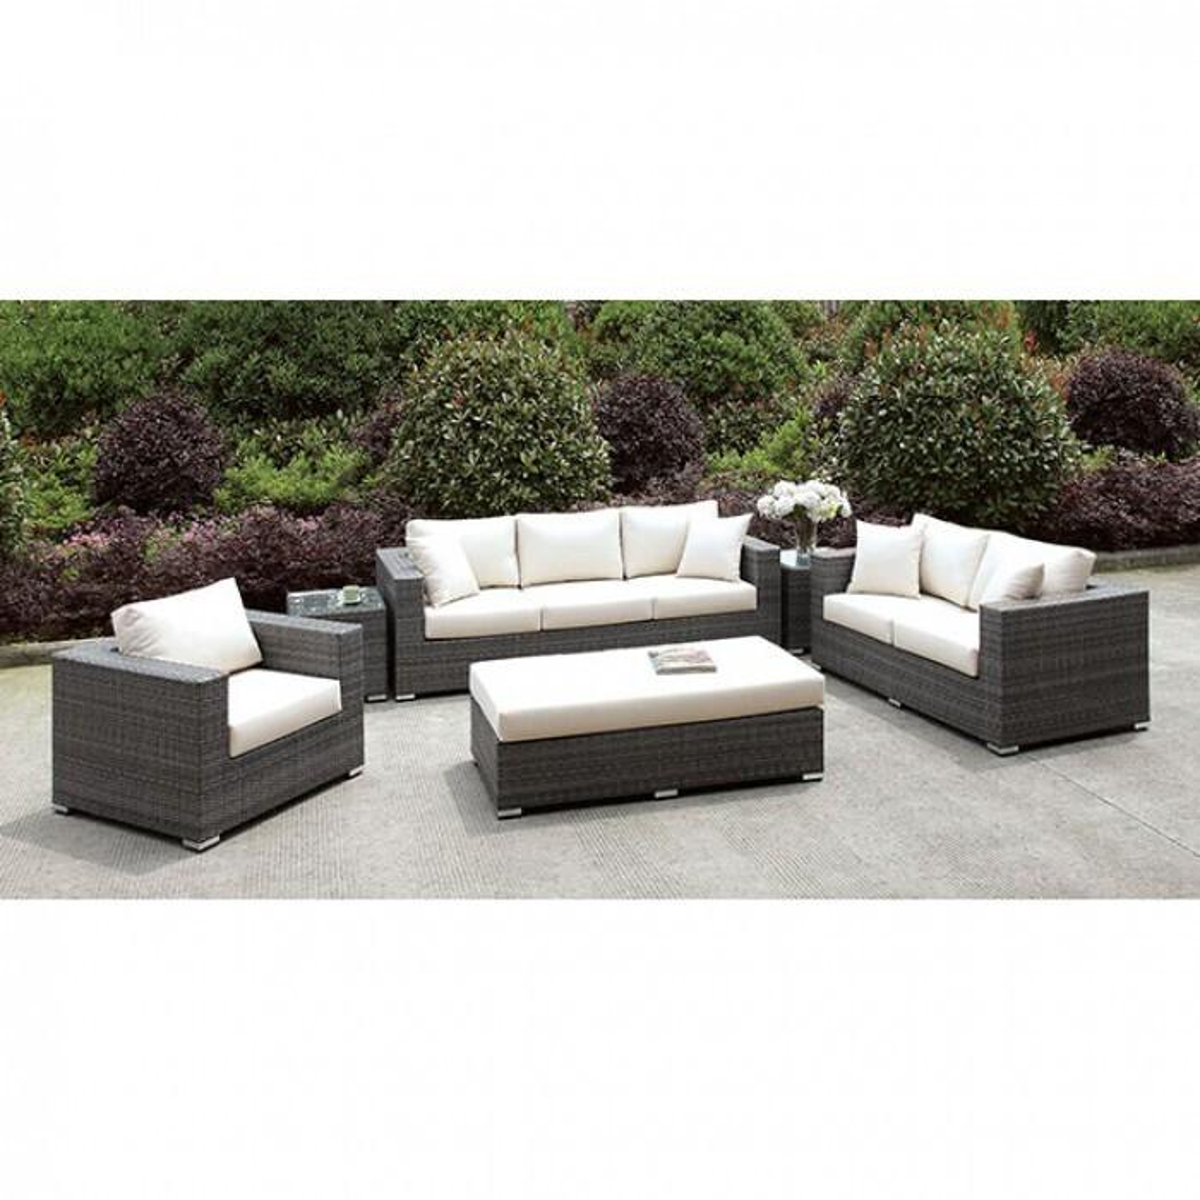 See Details - Somani 3 Pc Set + Bench + 2 End Tables